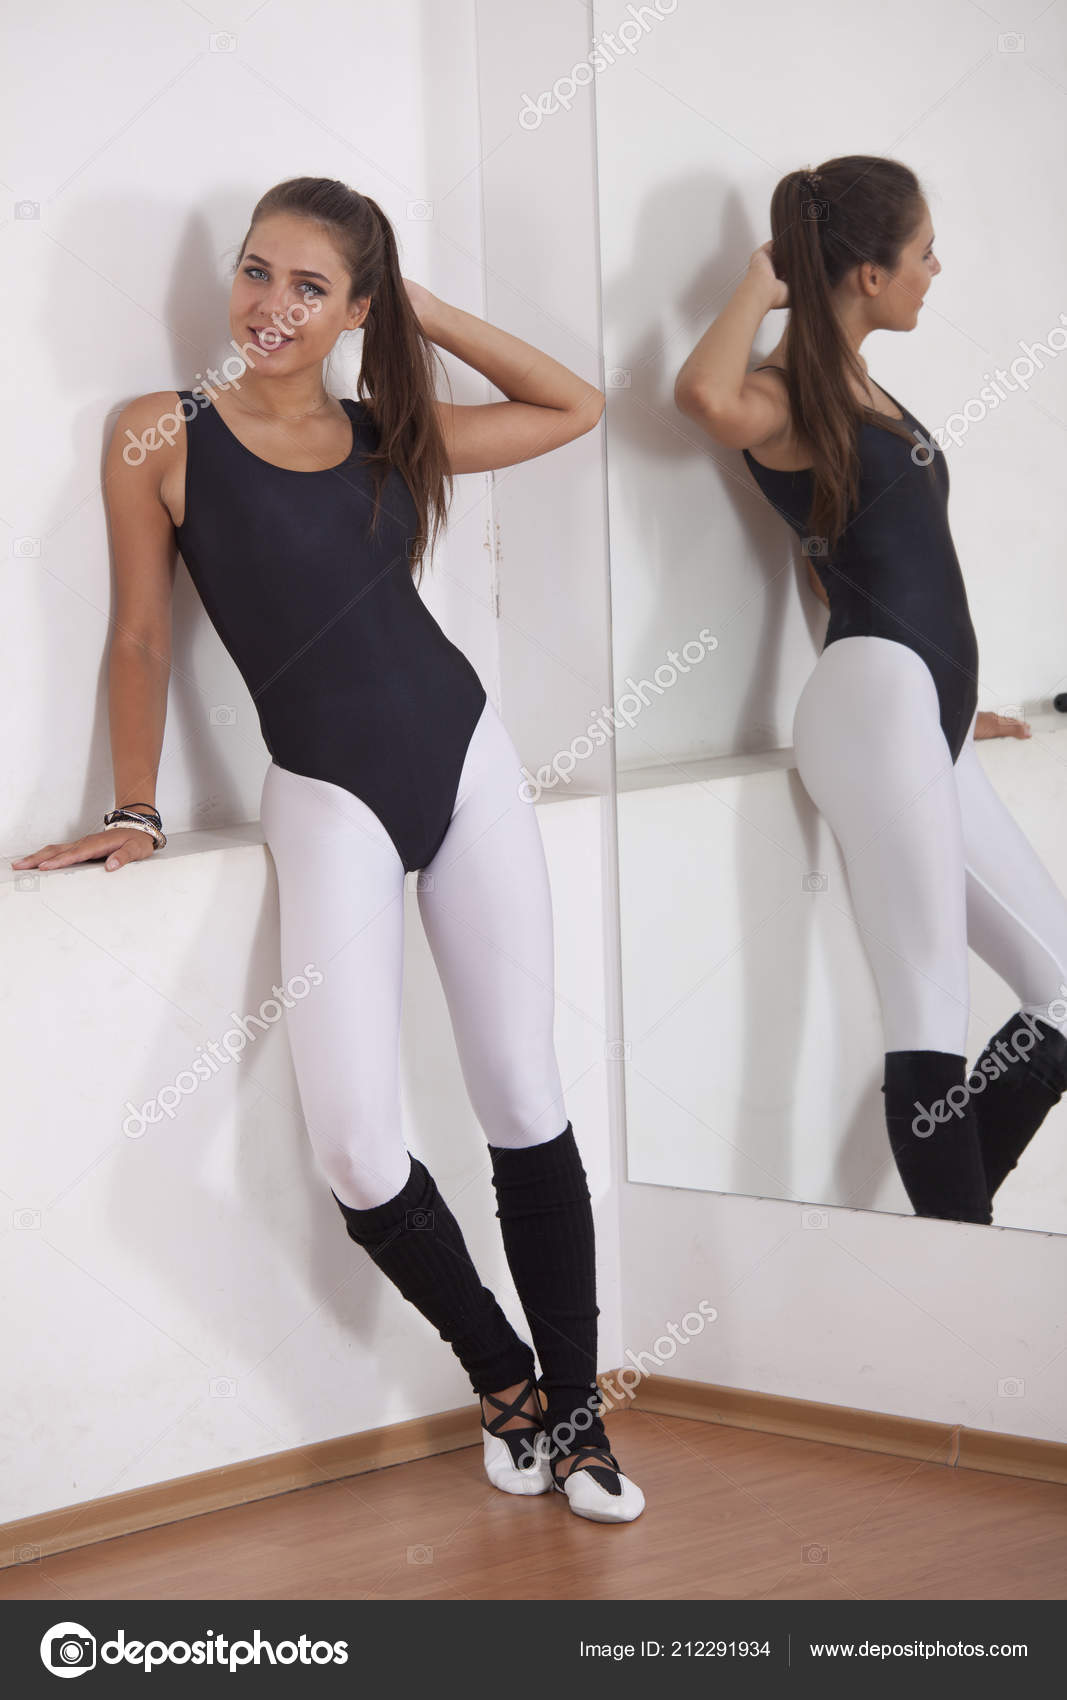 Anissa cosplay hot